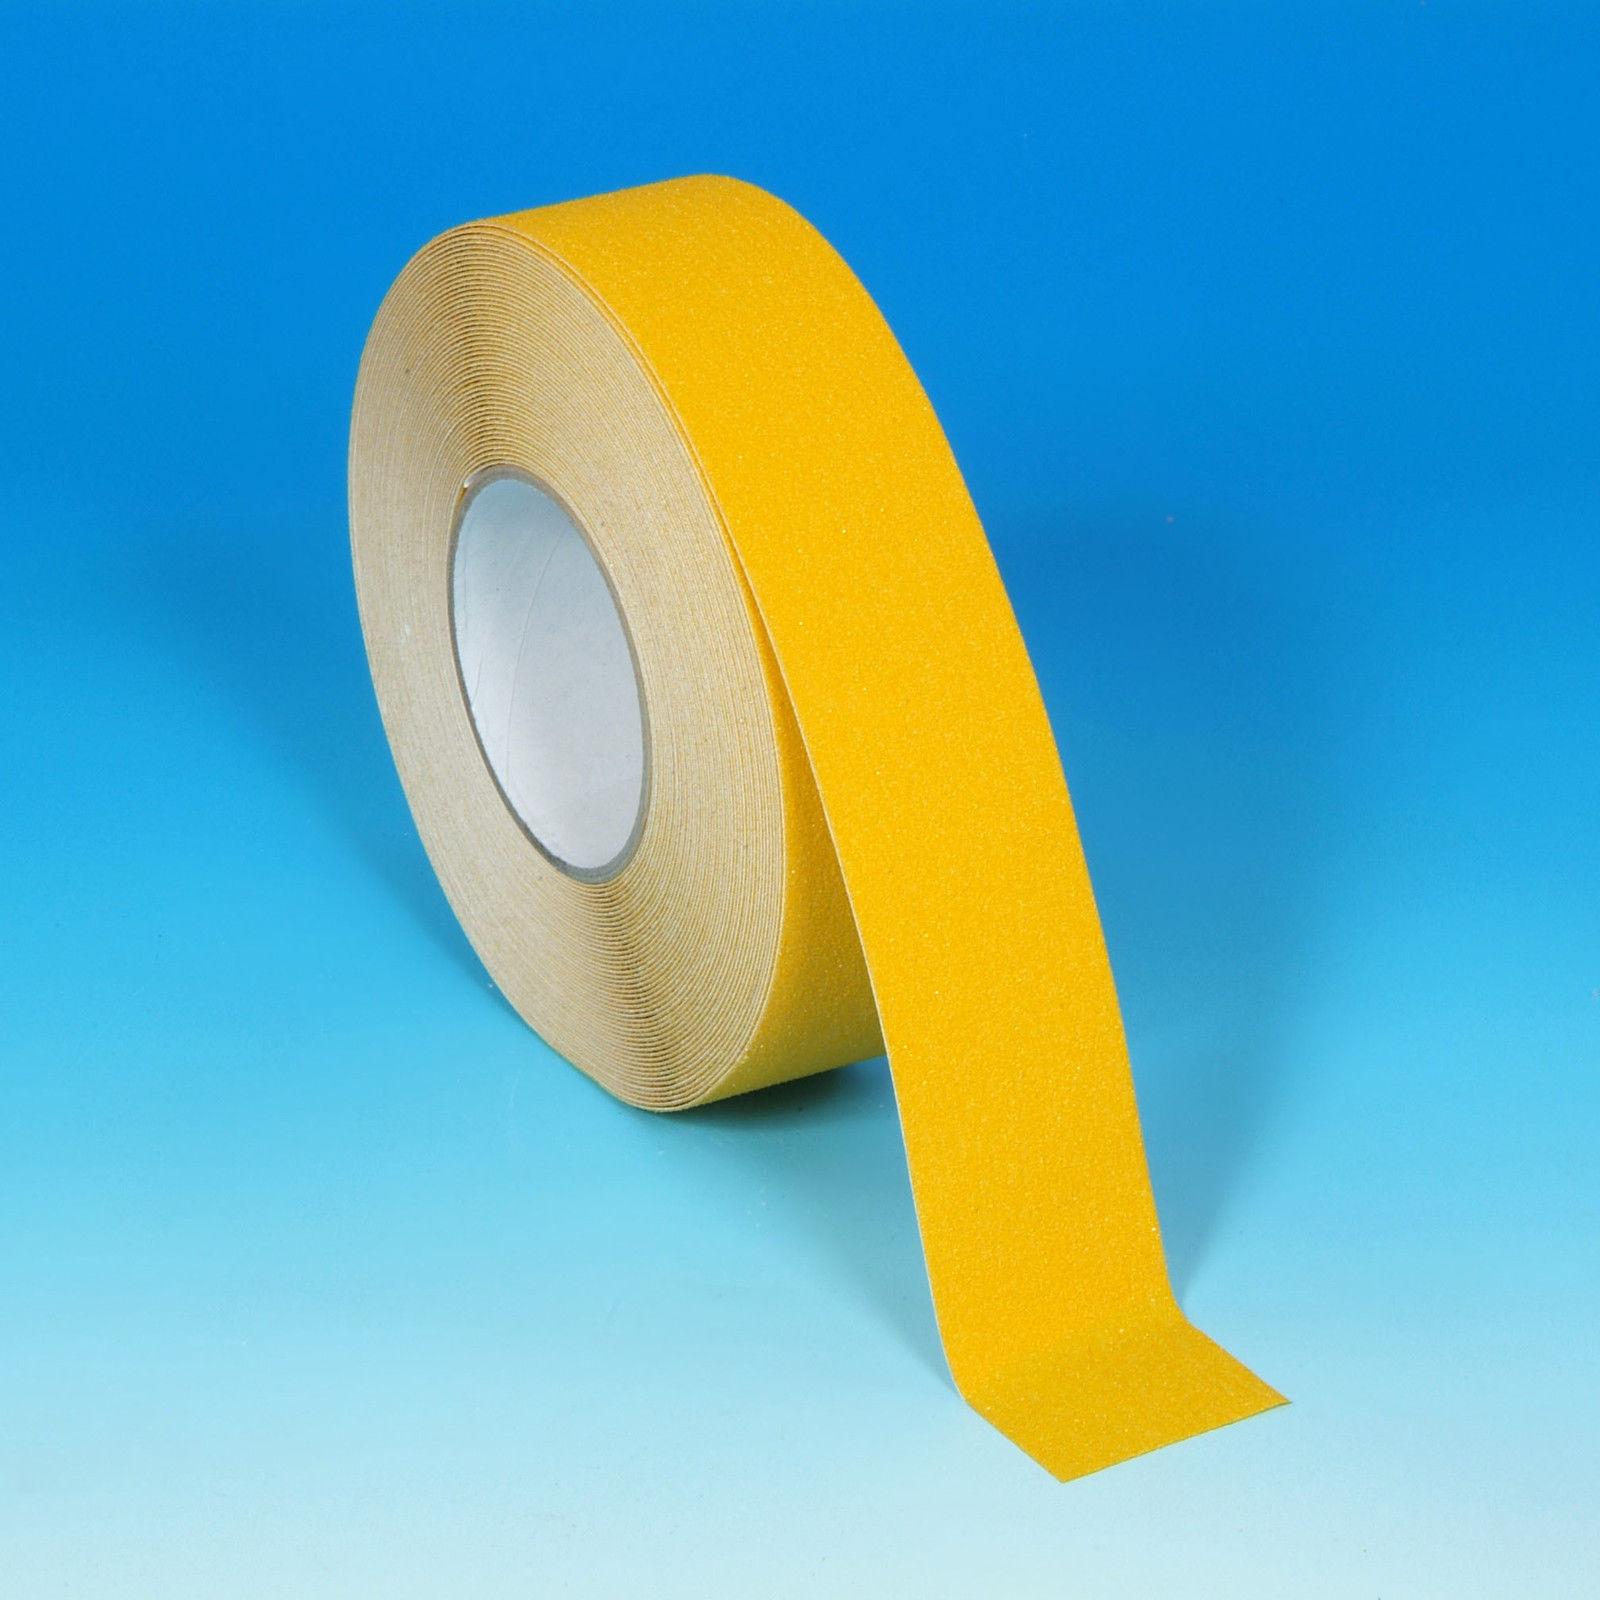 High Grip Adhesive Anti-Slip Tape Black/Yellow/Clear Non-Slip Tape Various Sizes